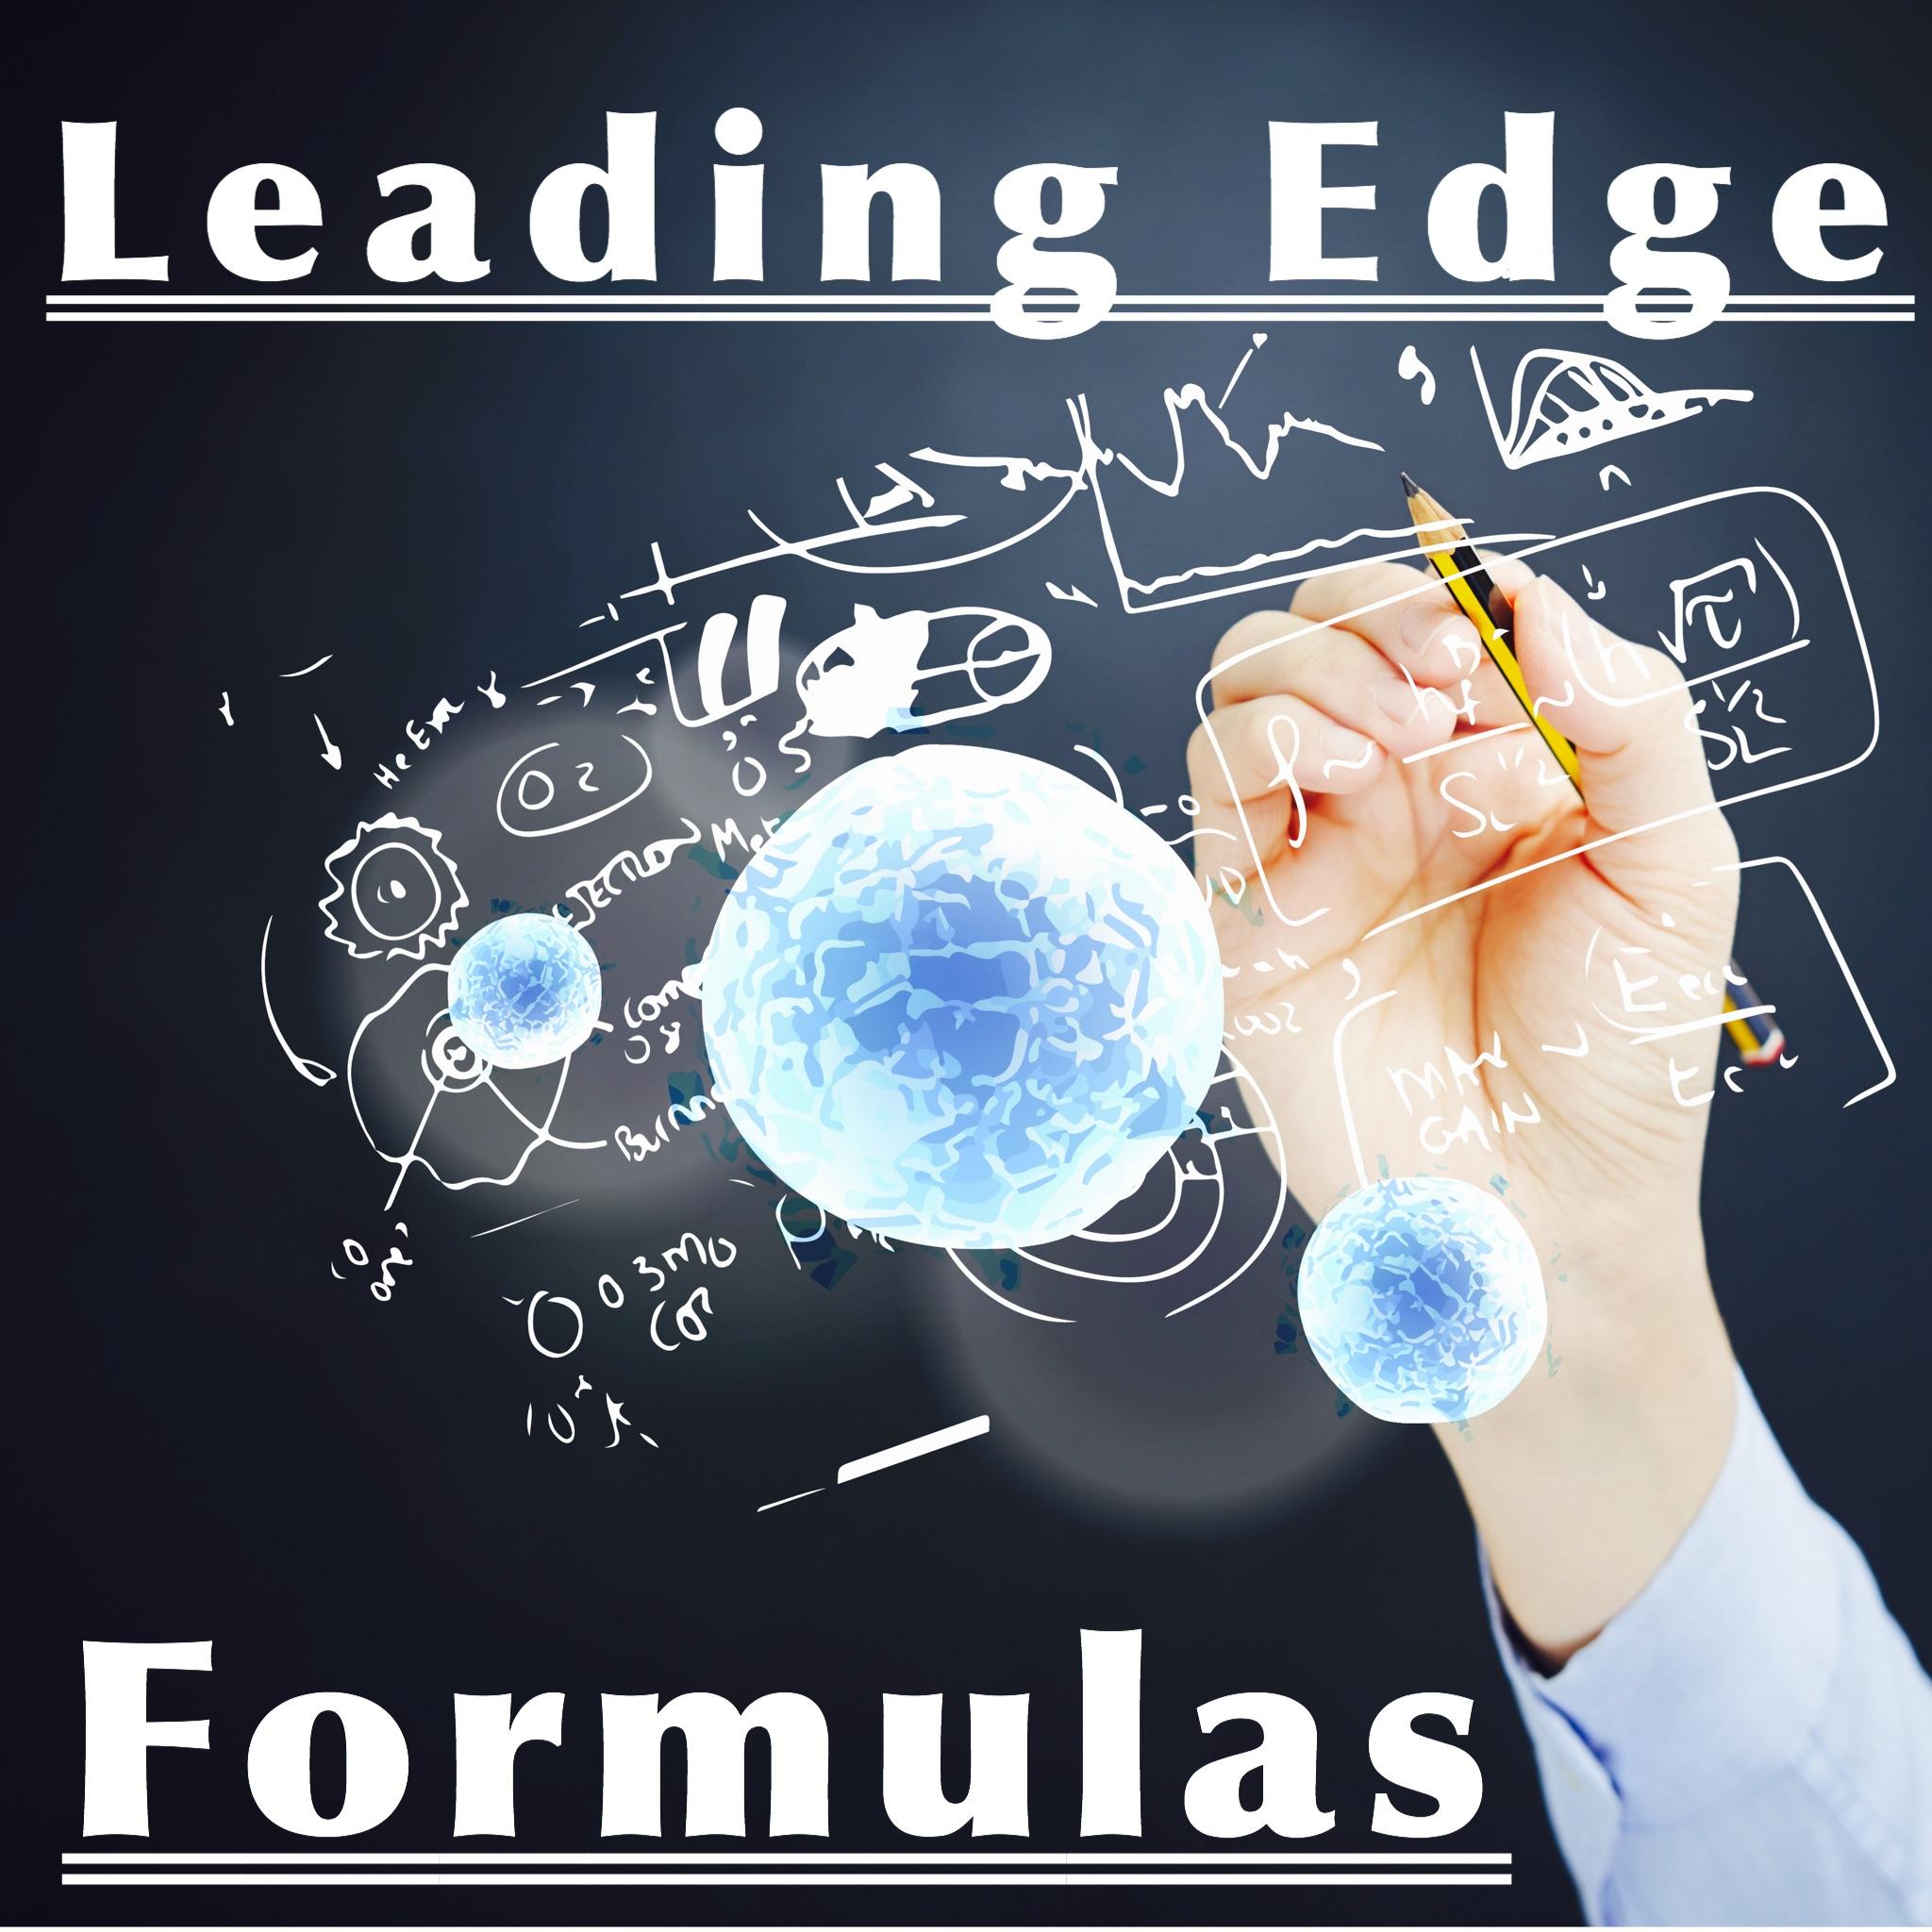 Leading Edge Formulas